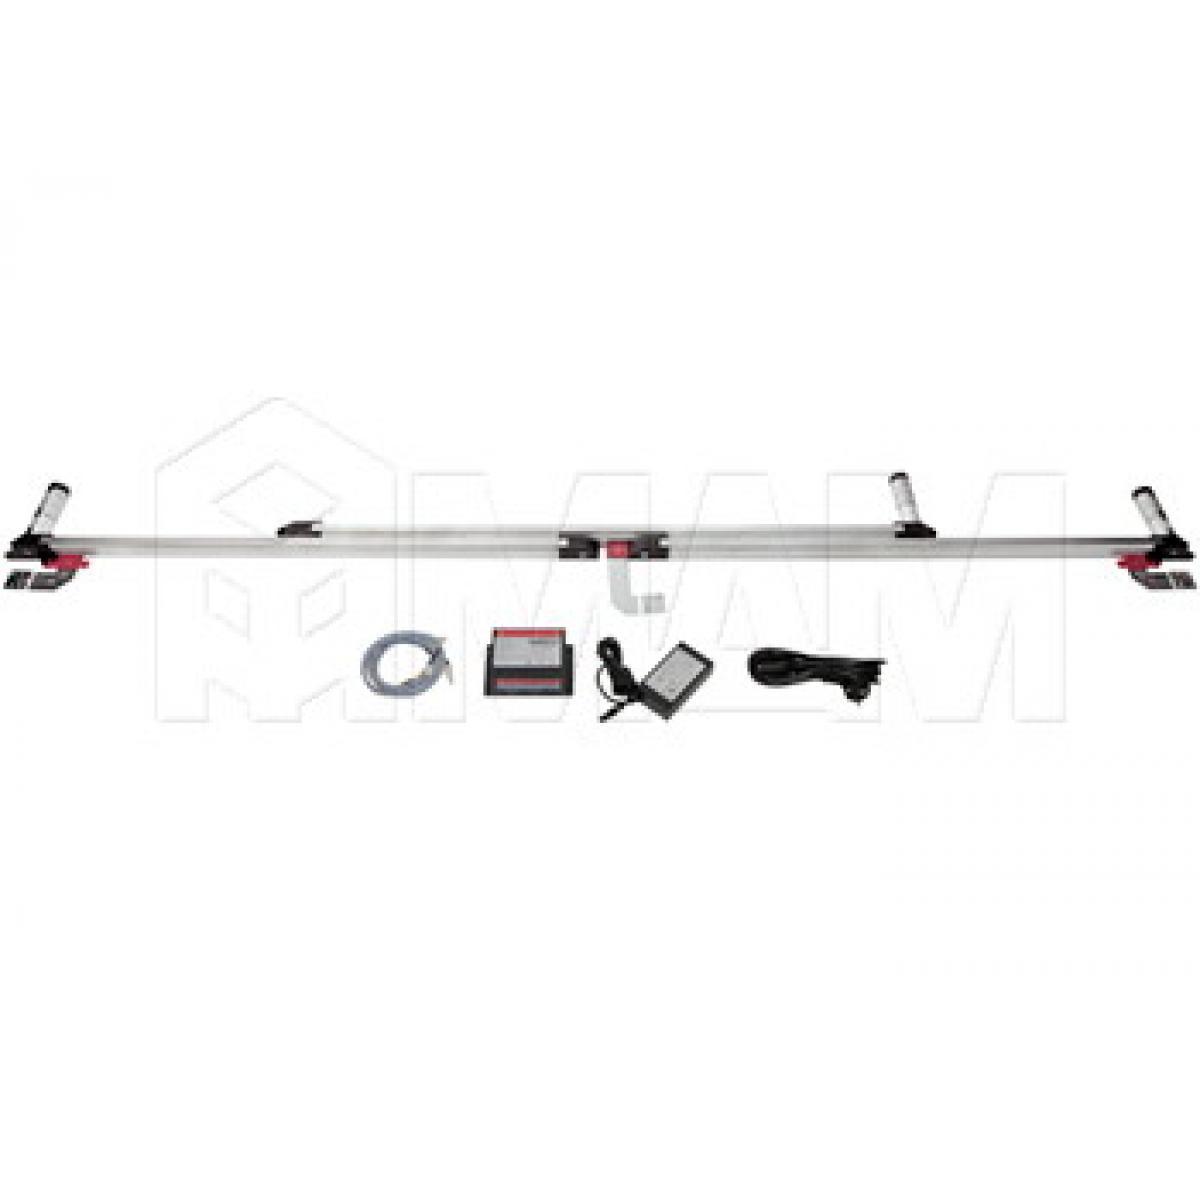 PS10 Электропривод для трехдверного шкафа шириной 2500-3100 мм